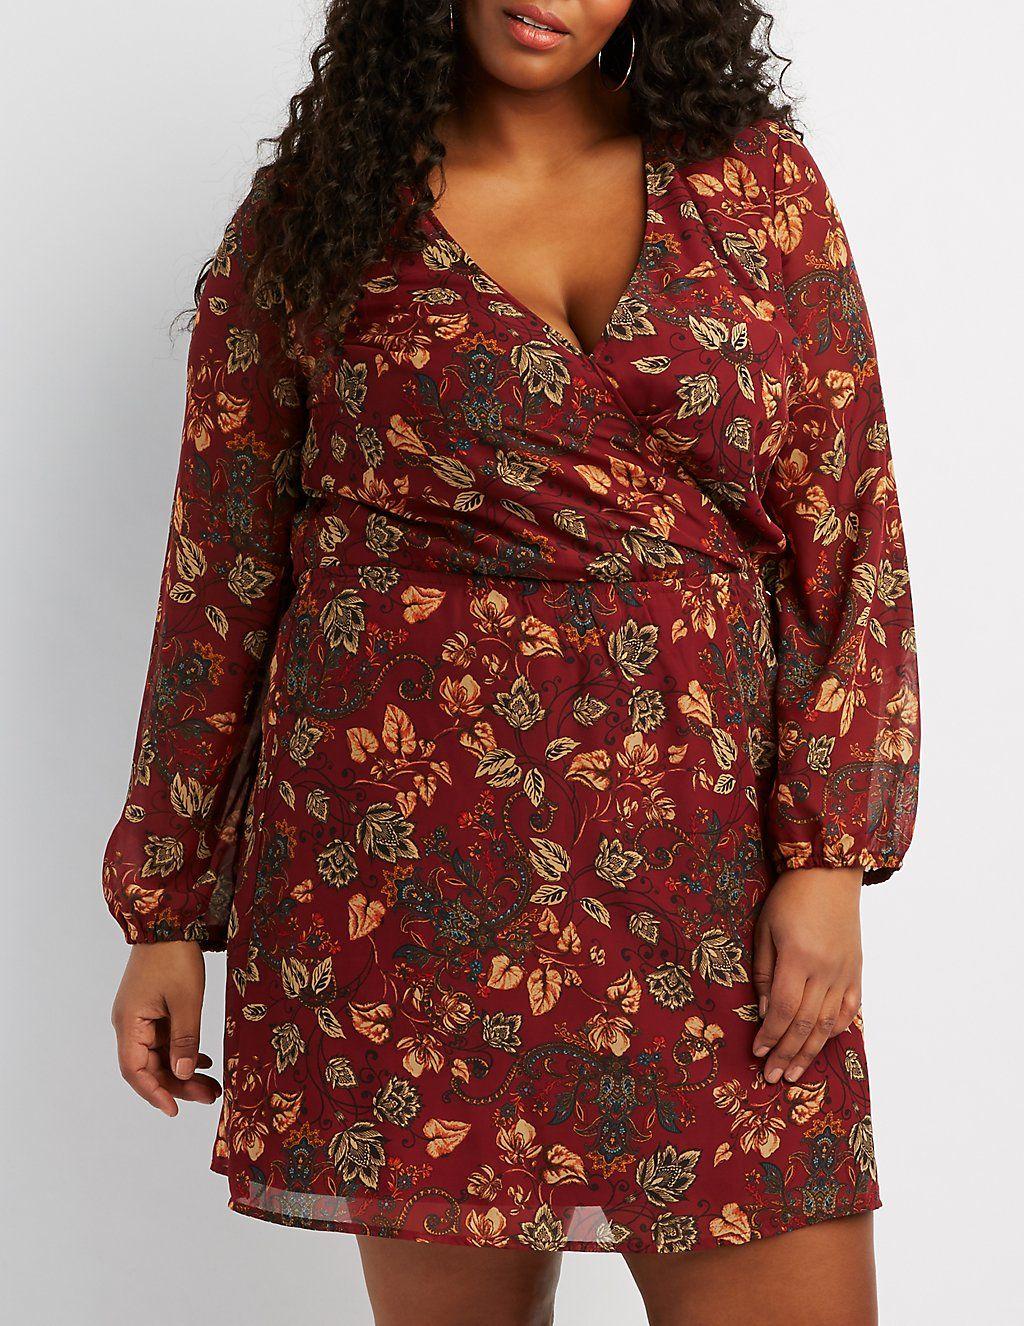 Plus size floral surplice dress surplice dress long balloons and